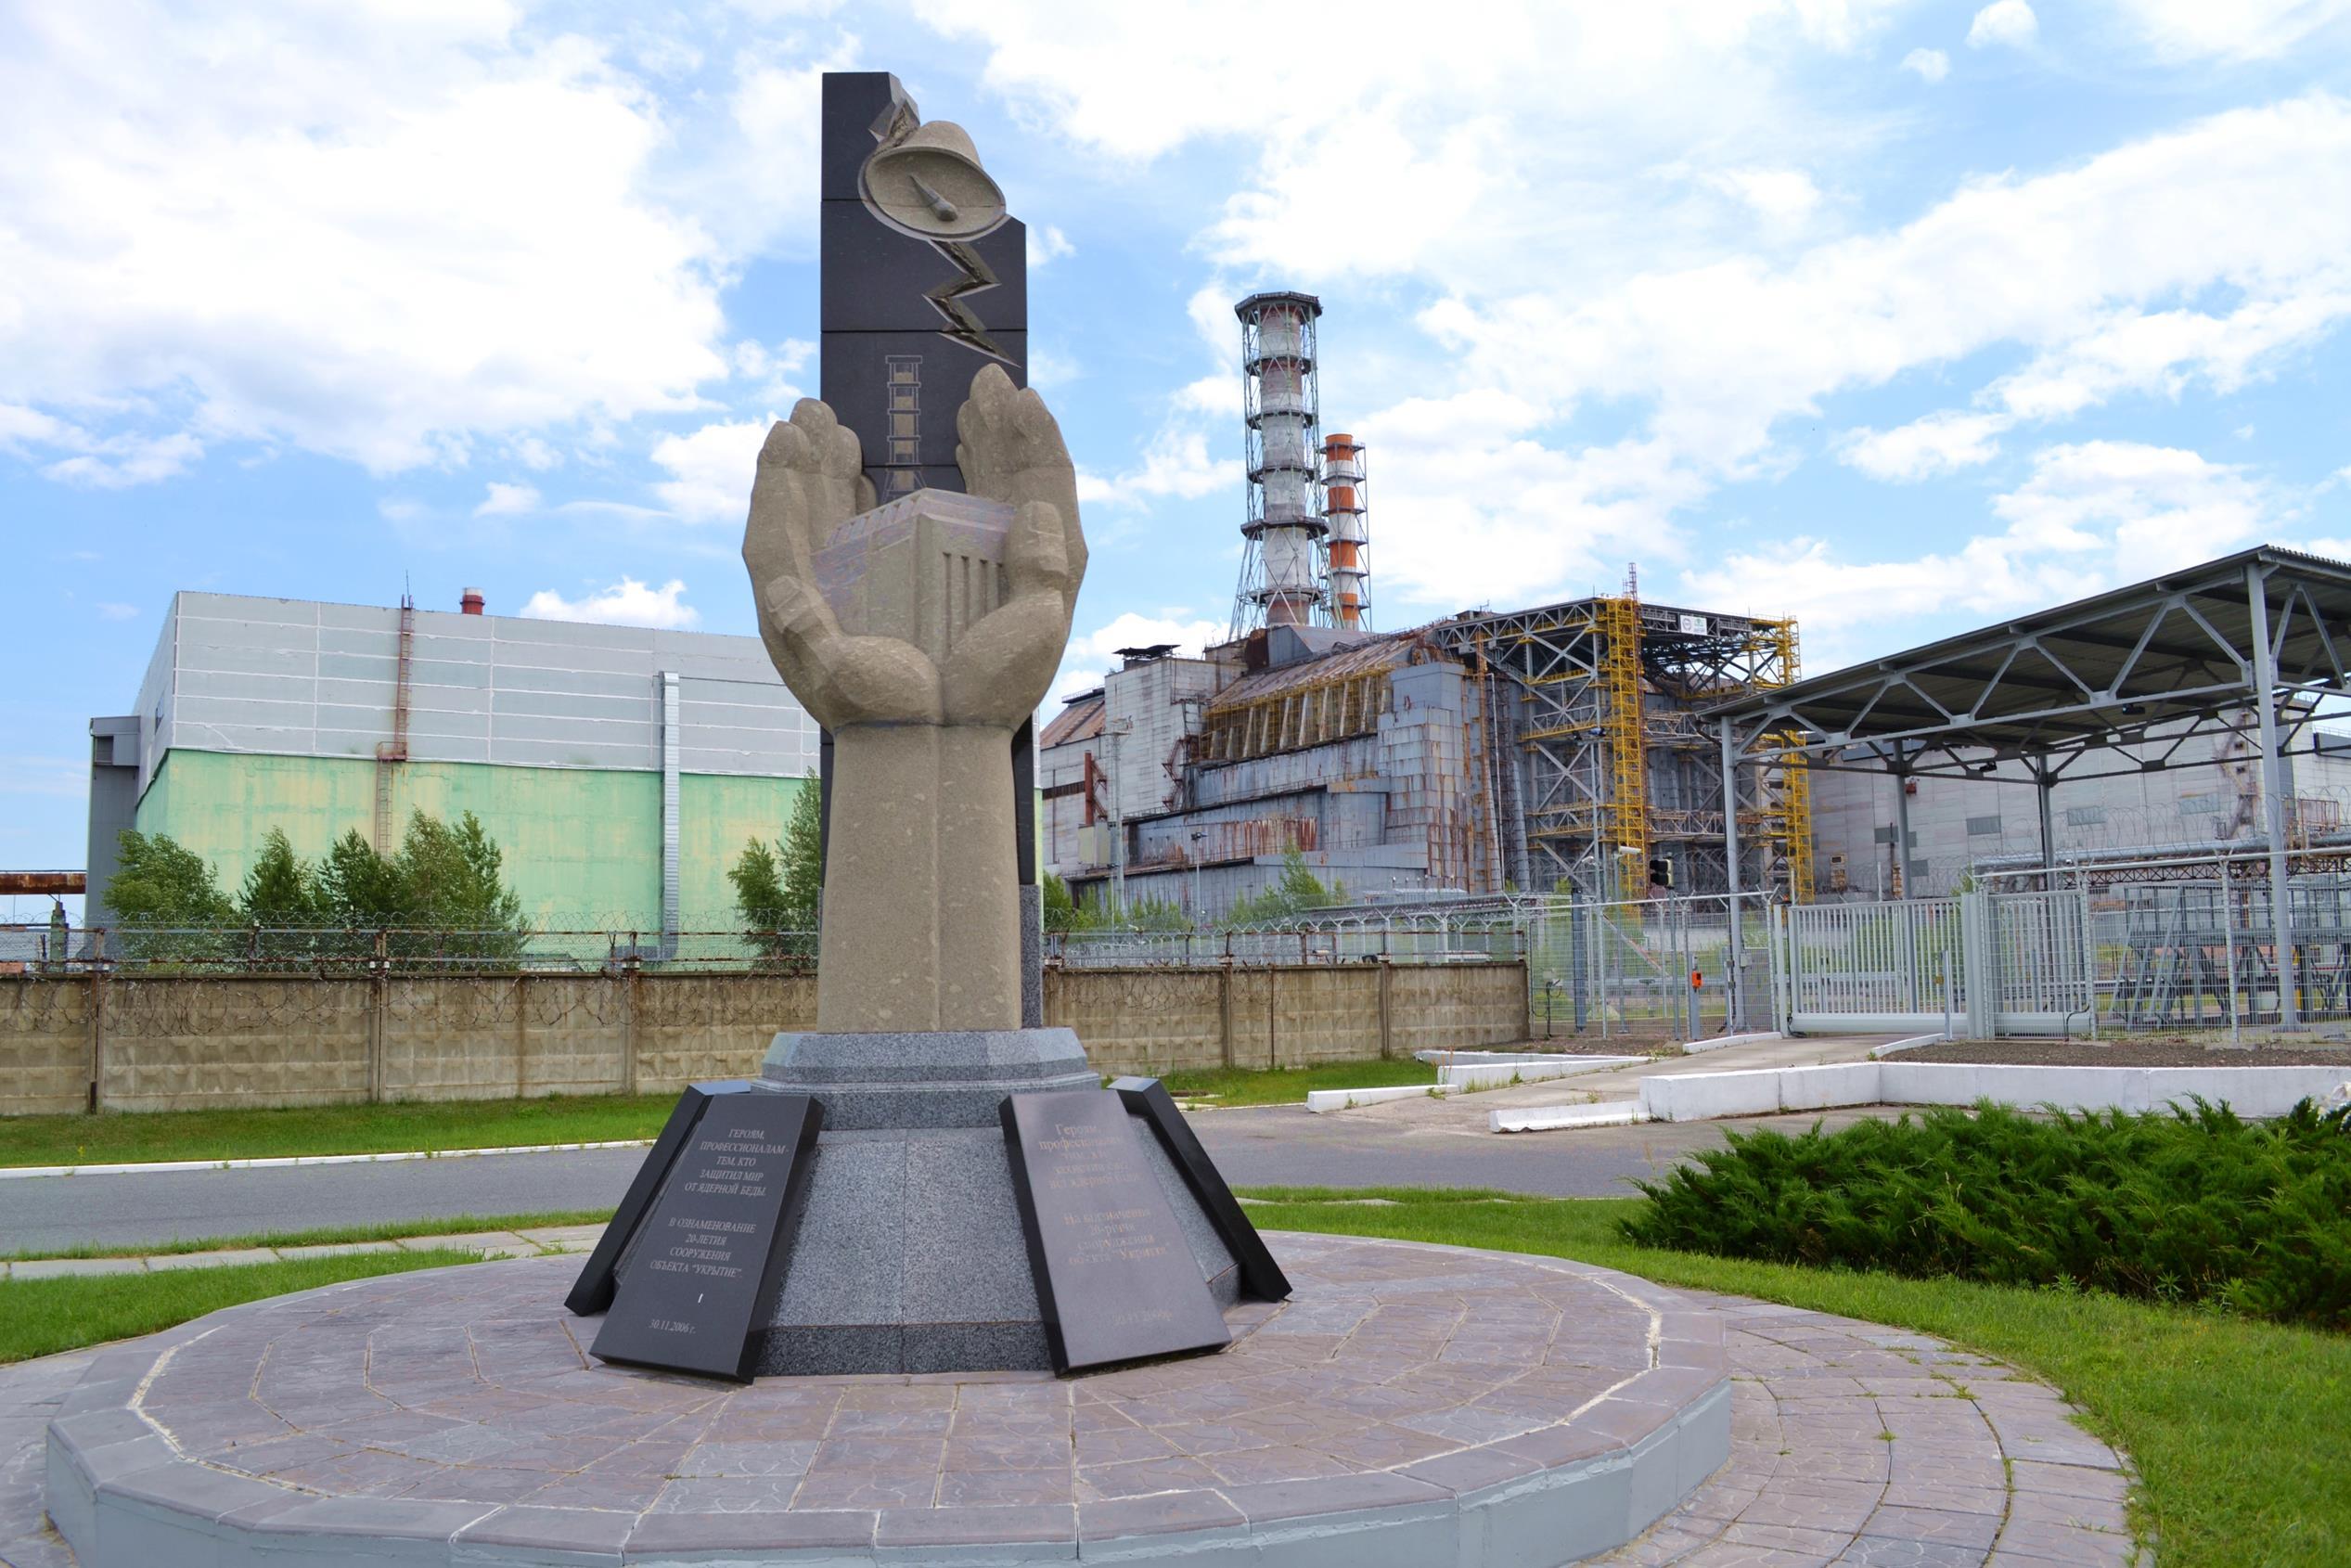 chernobyl_ucrania_reator4